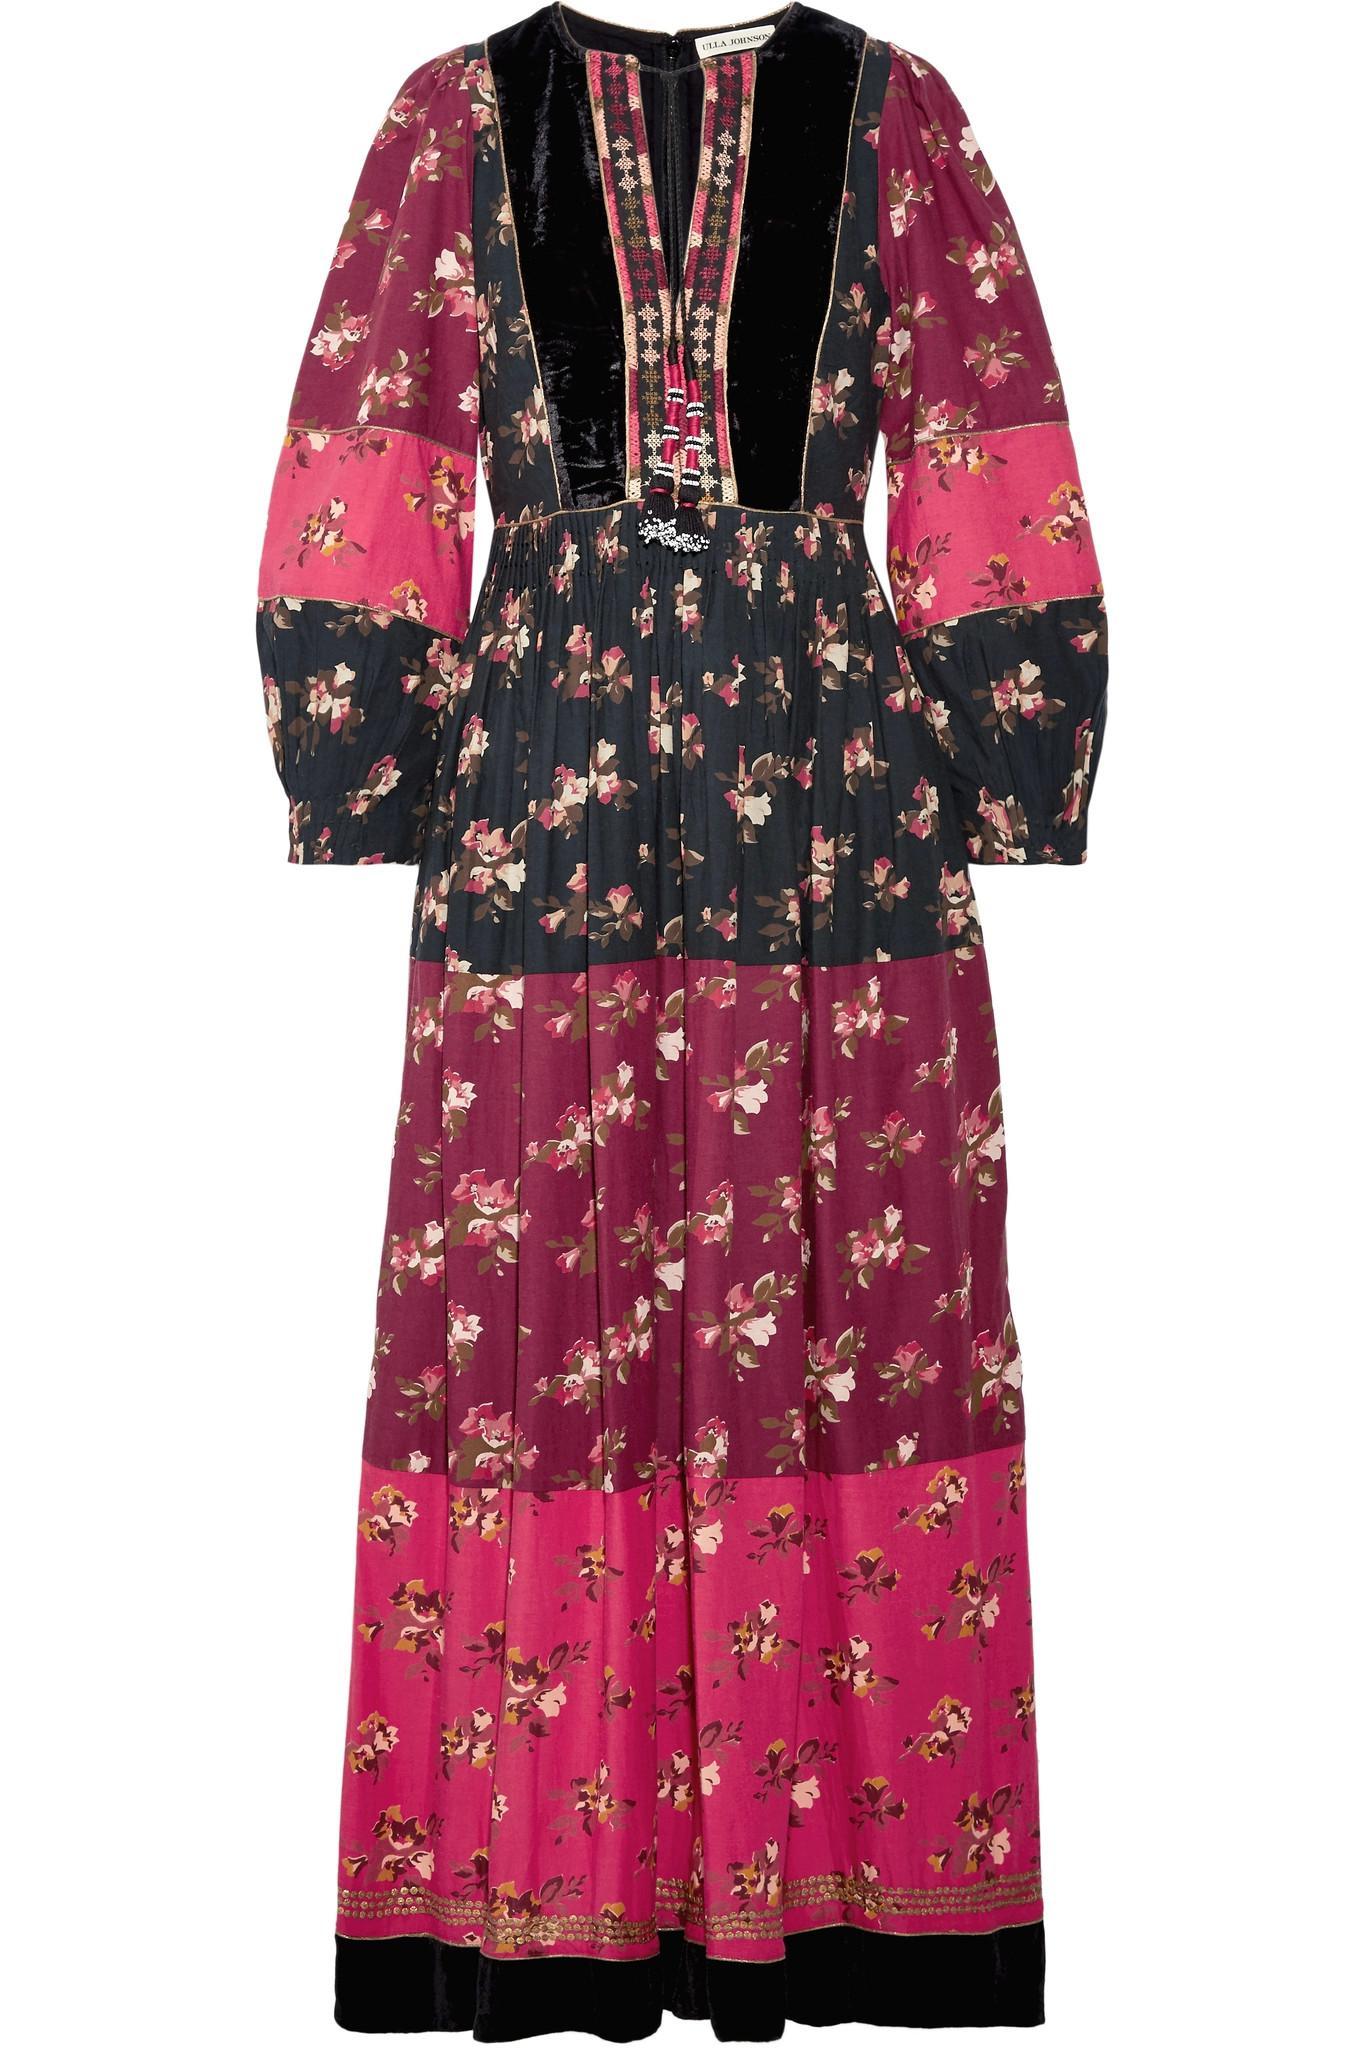 Suzana Velvet-trimmed Printed Cotton-blend Maxi Dress - Pink Ulla Johnson 3pMNlL